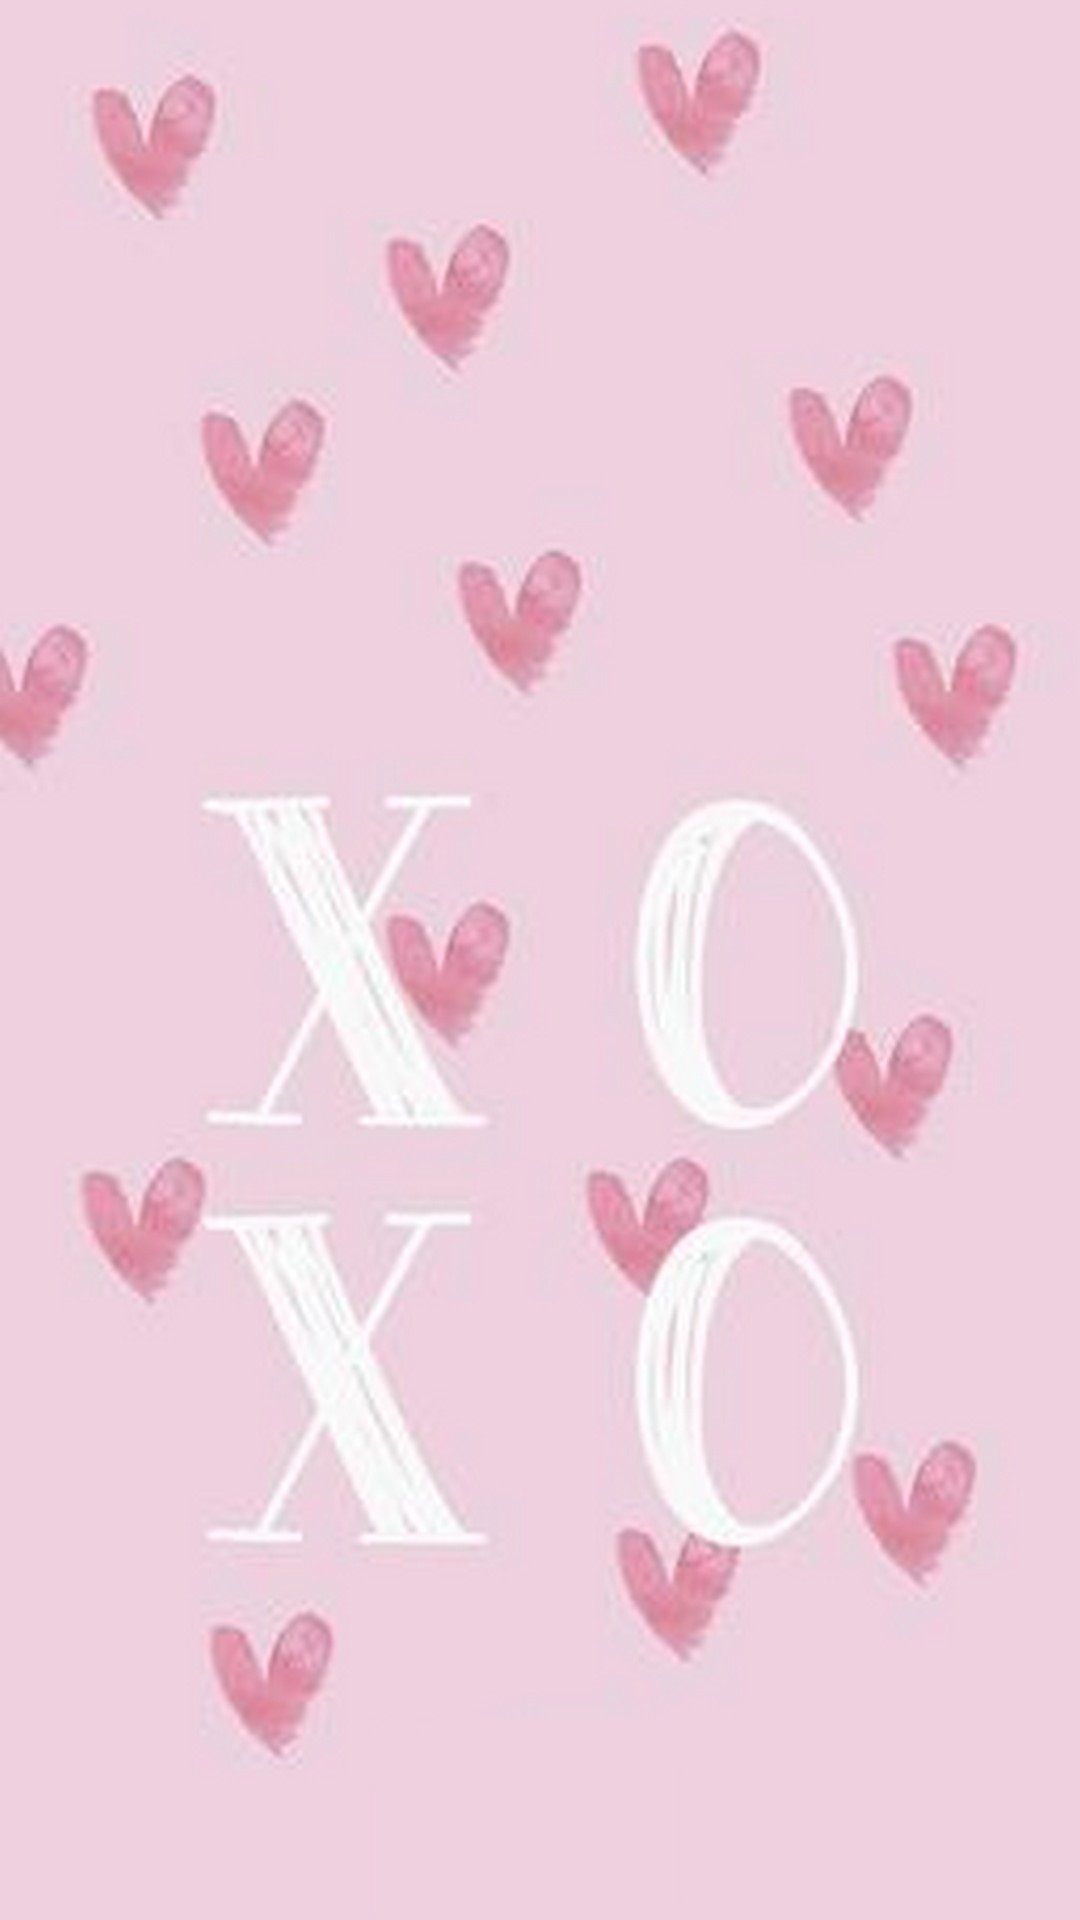 Heart Valentine Iphone Wallpaper Best Hd Wallpapers Valentines Wallpaper Iphone Valentines Wallpaper Wallpaper Iphone Girly